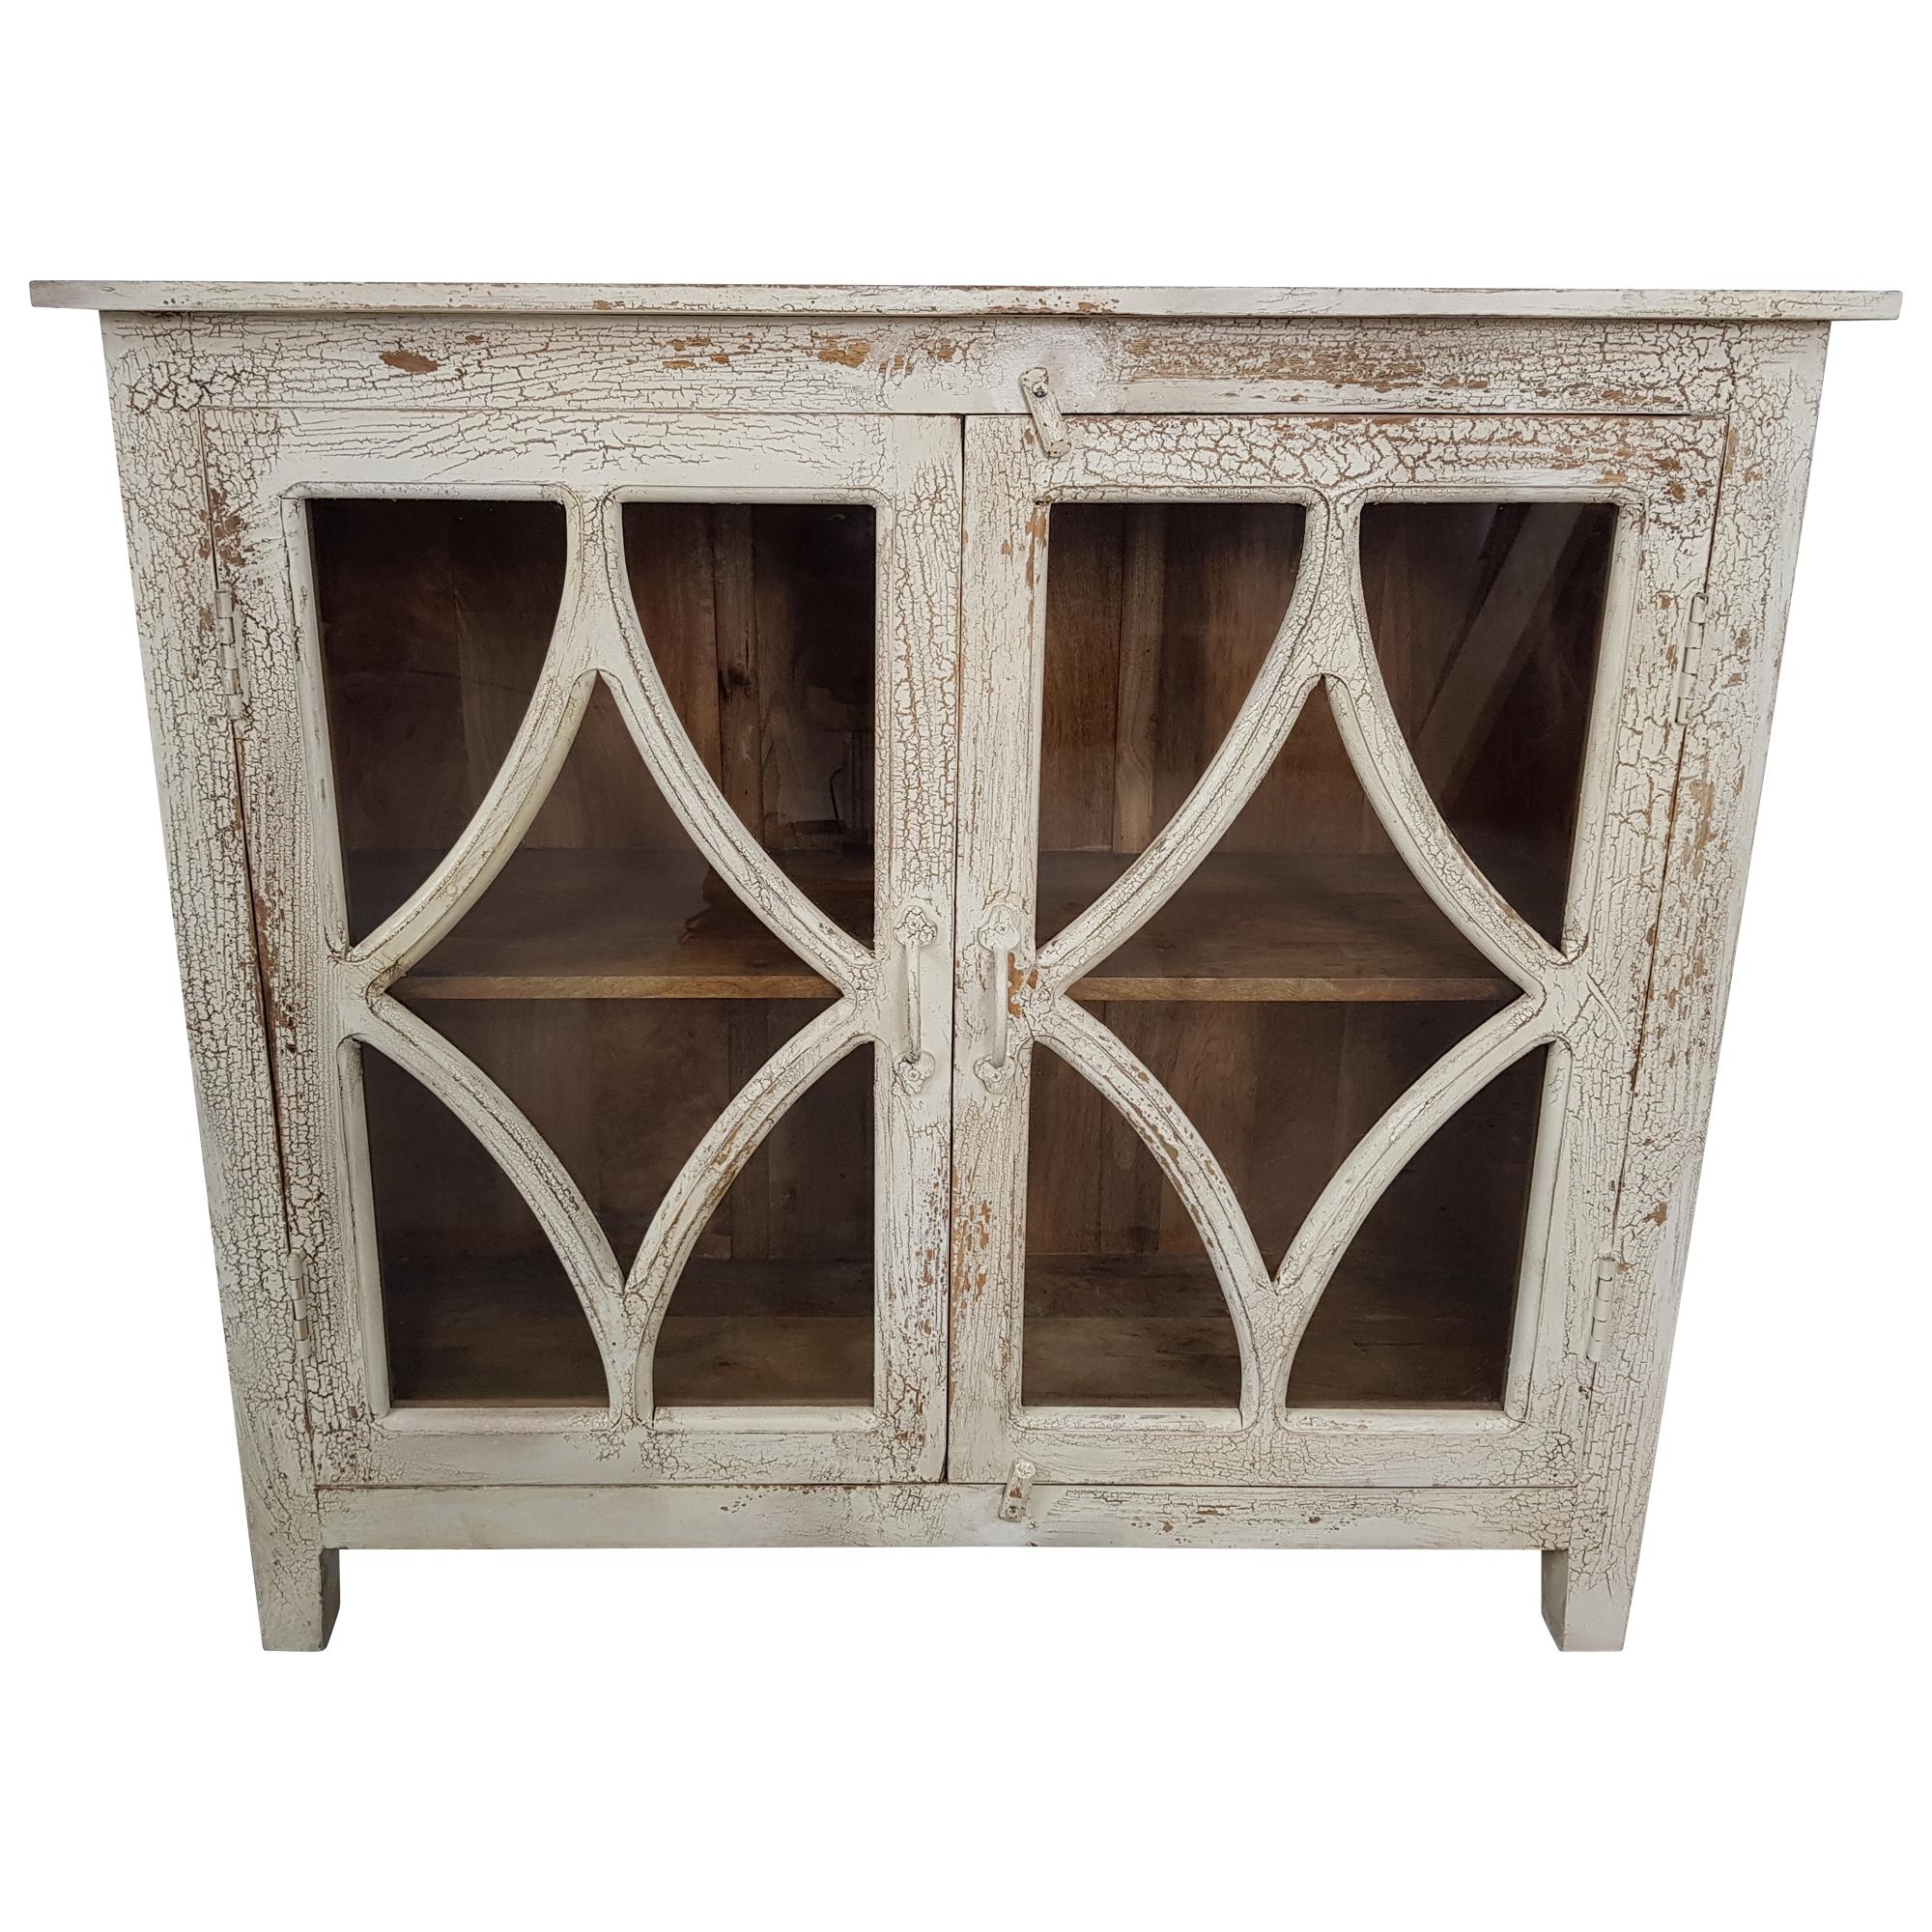 vorschau kommode anrichte vitrine schrank weiss massivholz vintage shabby chic unikat 4